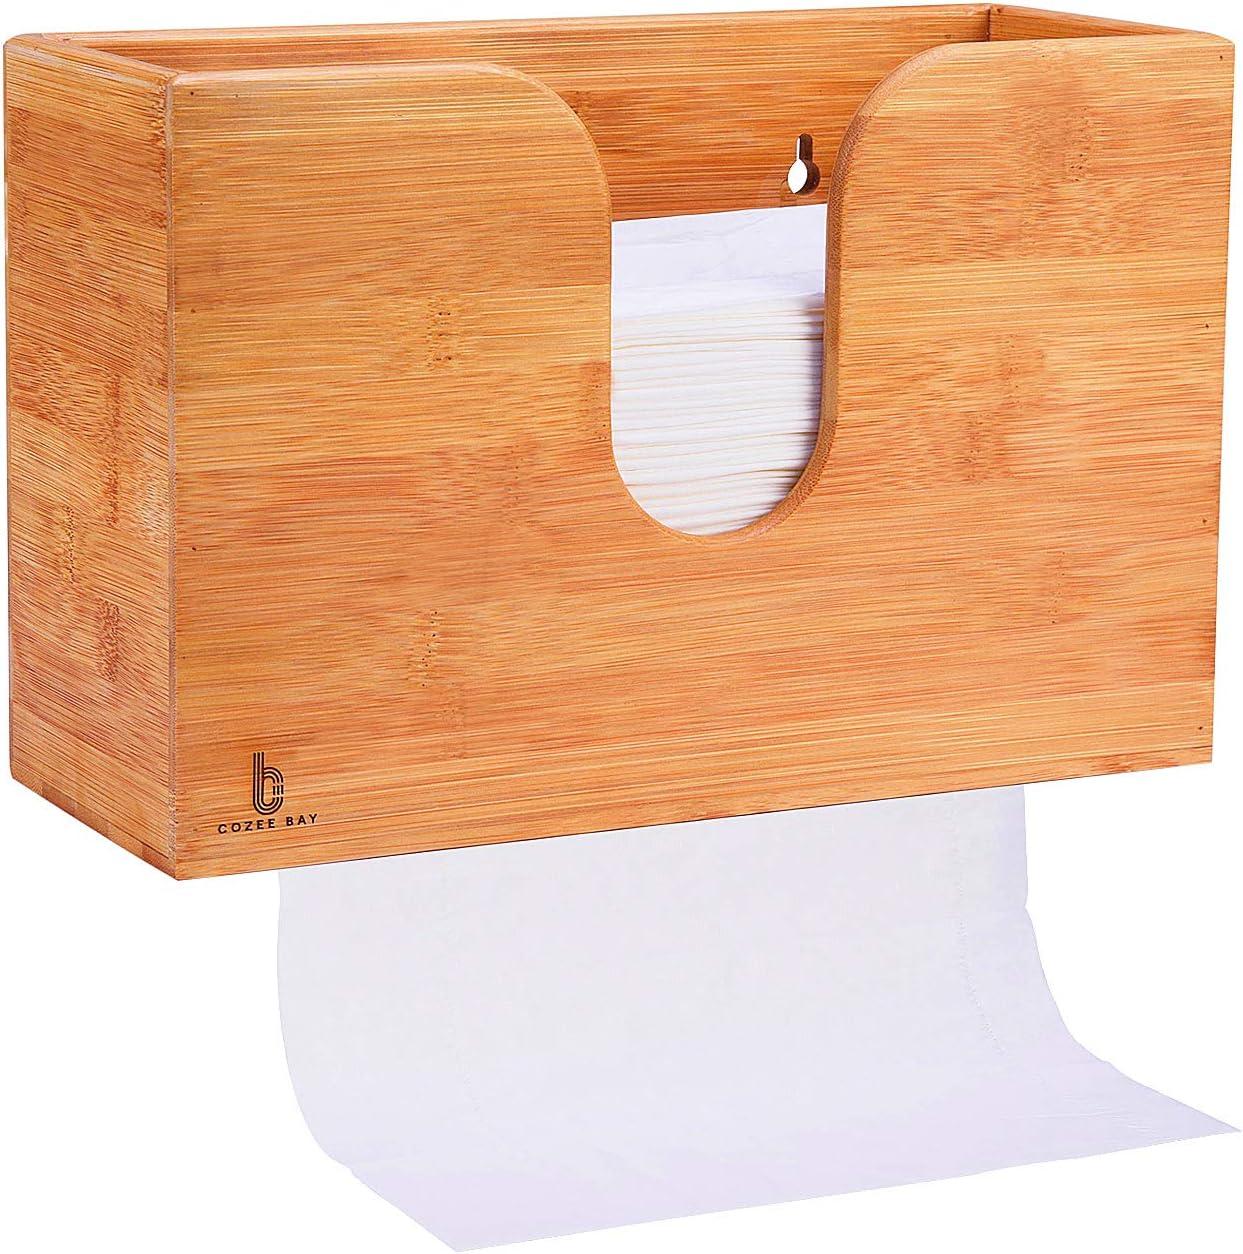 Cozee Bay Bamboo Kitchen Paper Towel Dispenser